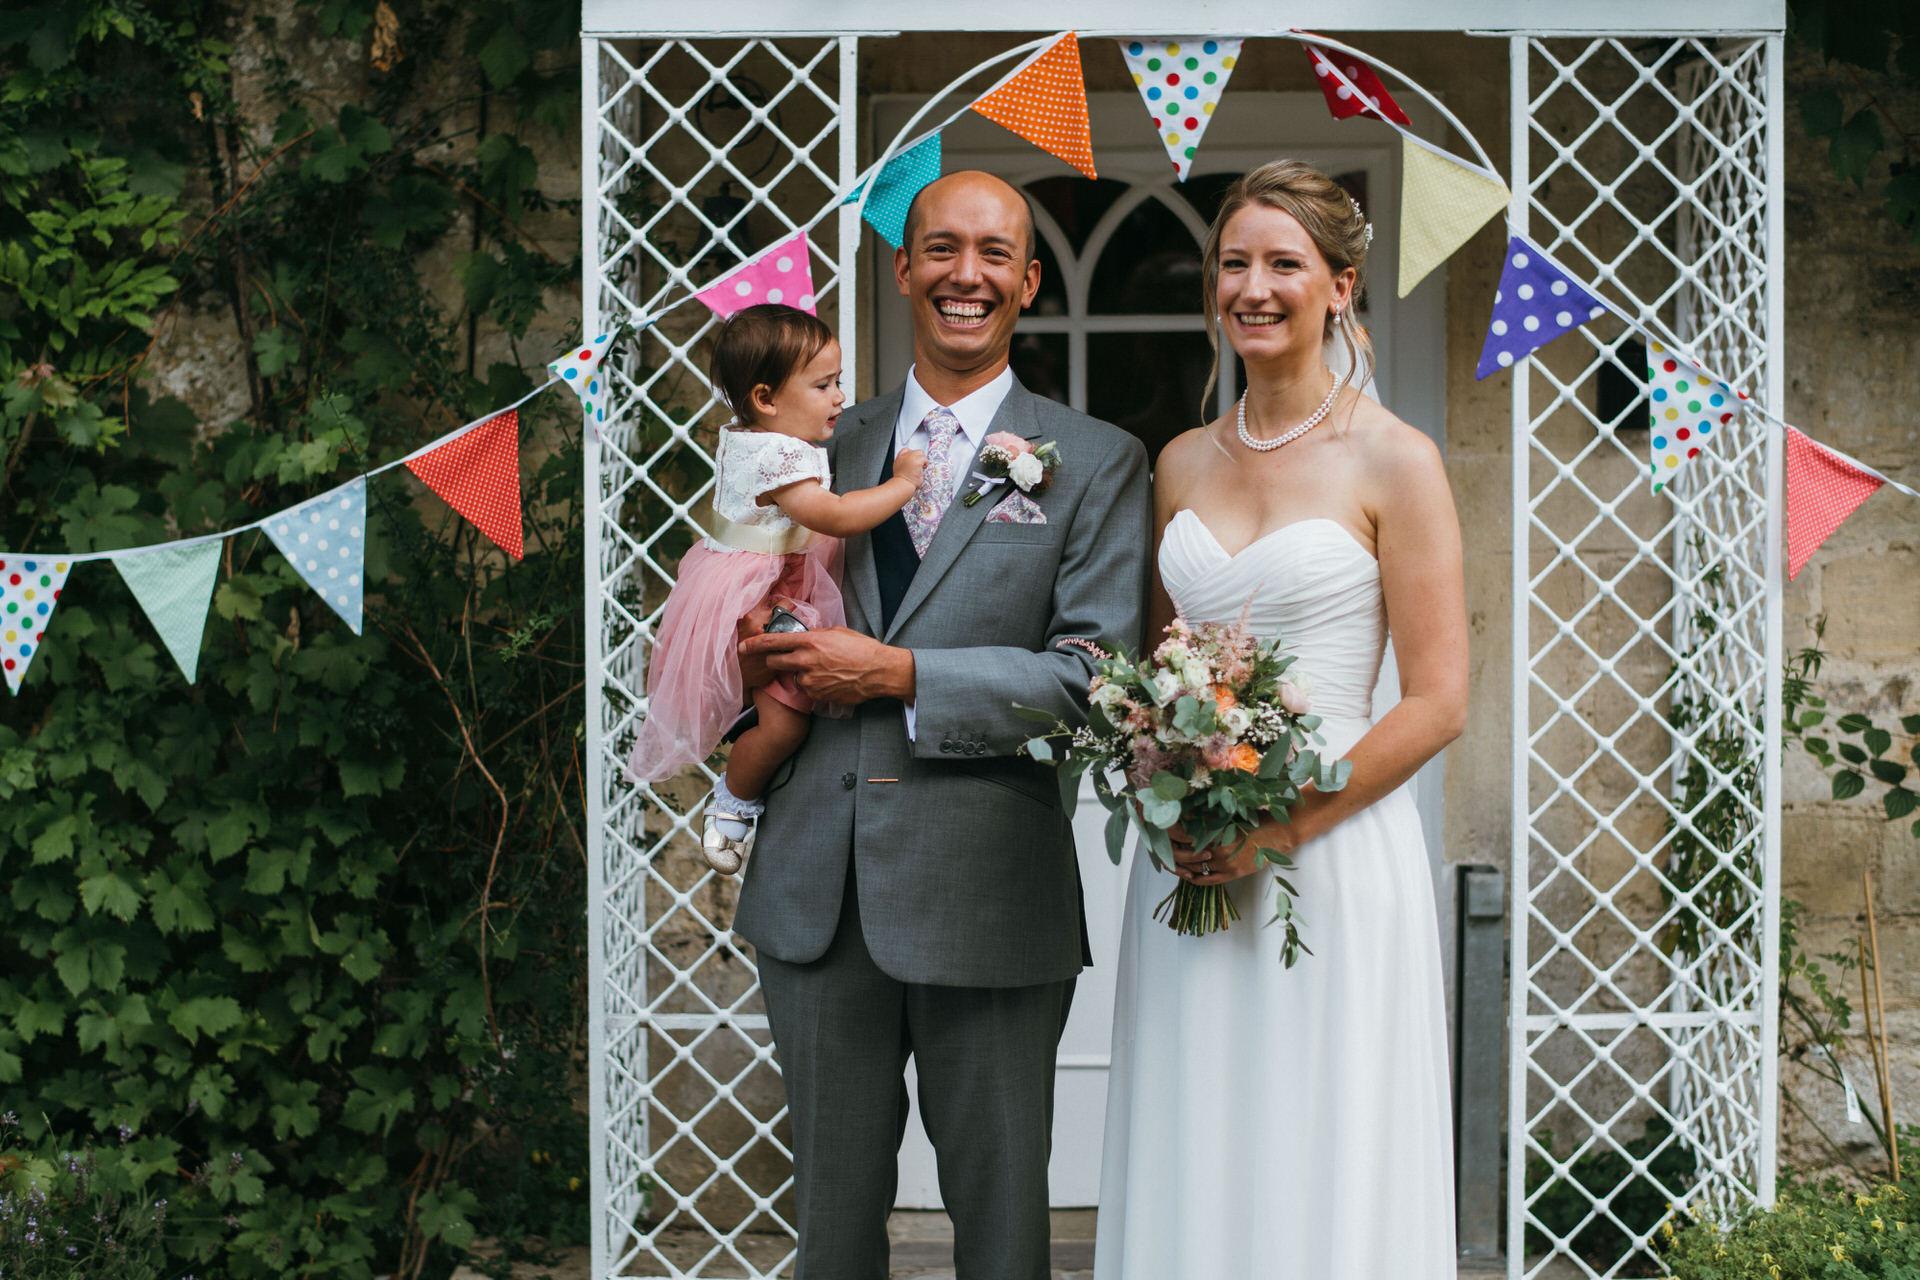 Midford Mill wedding